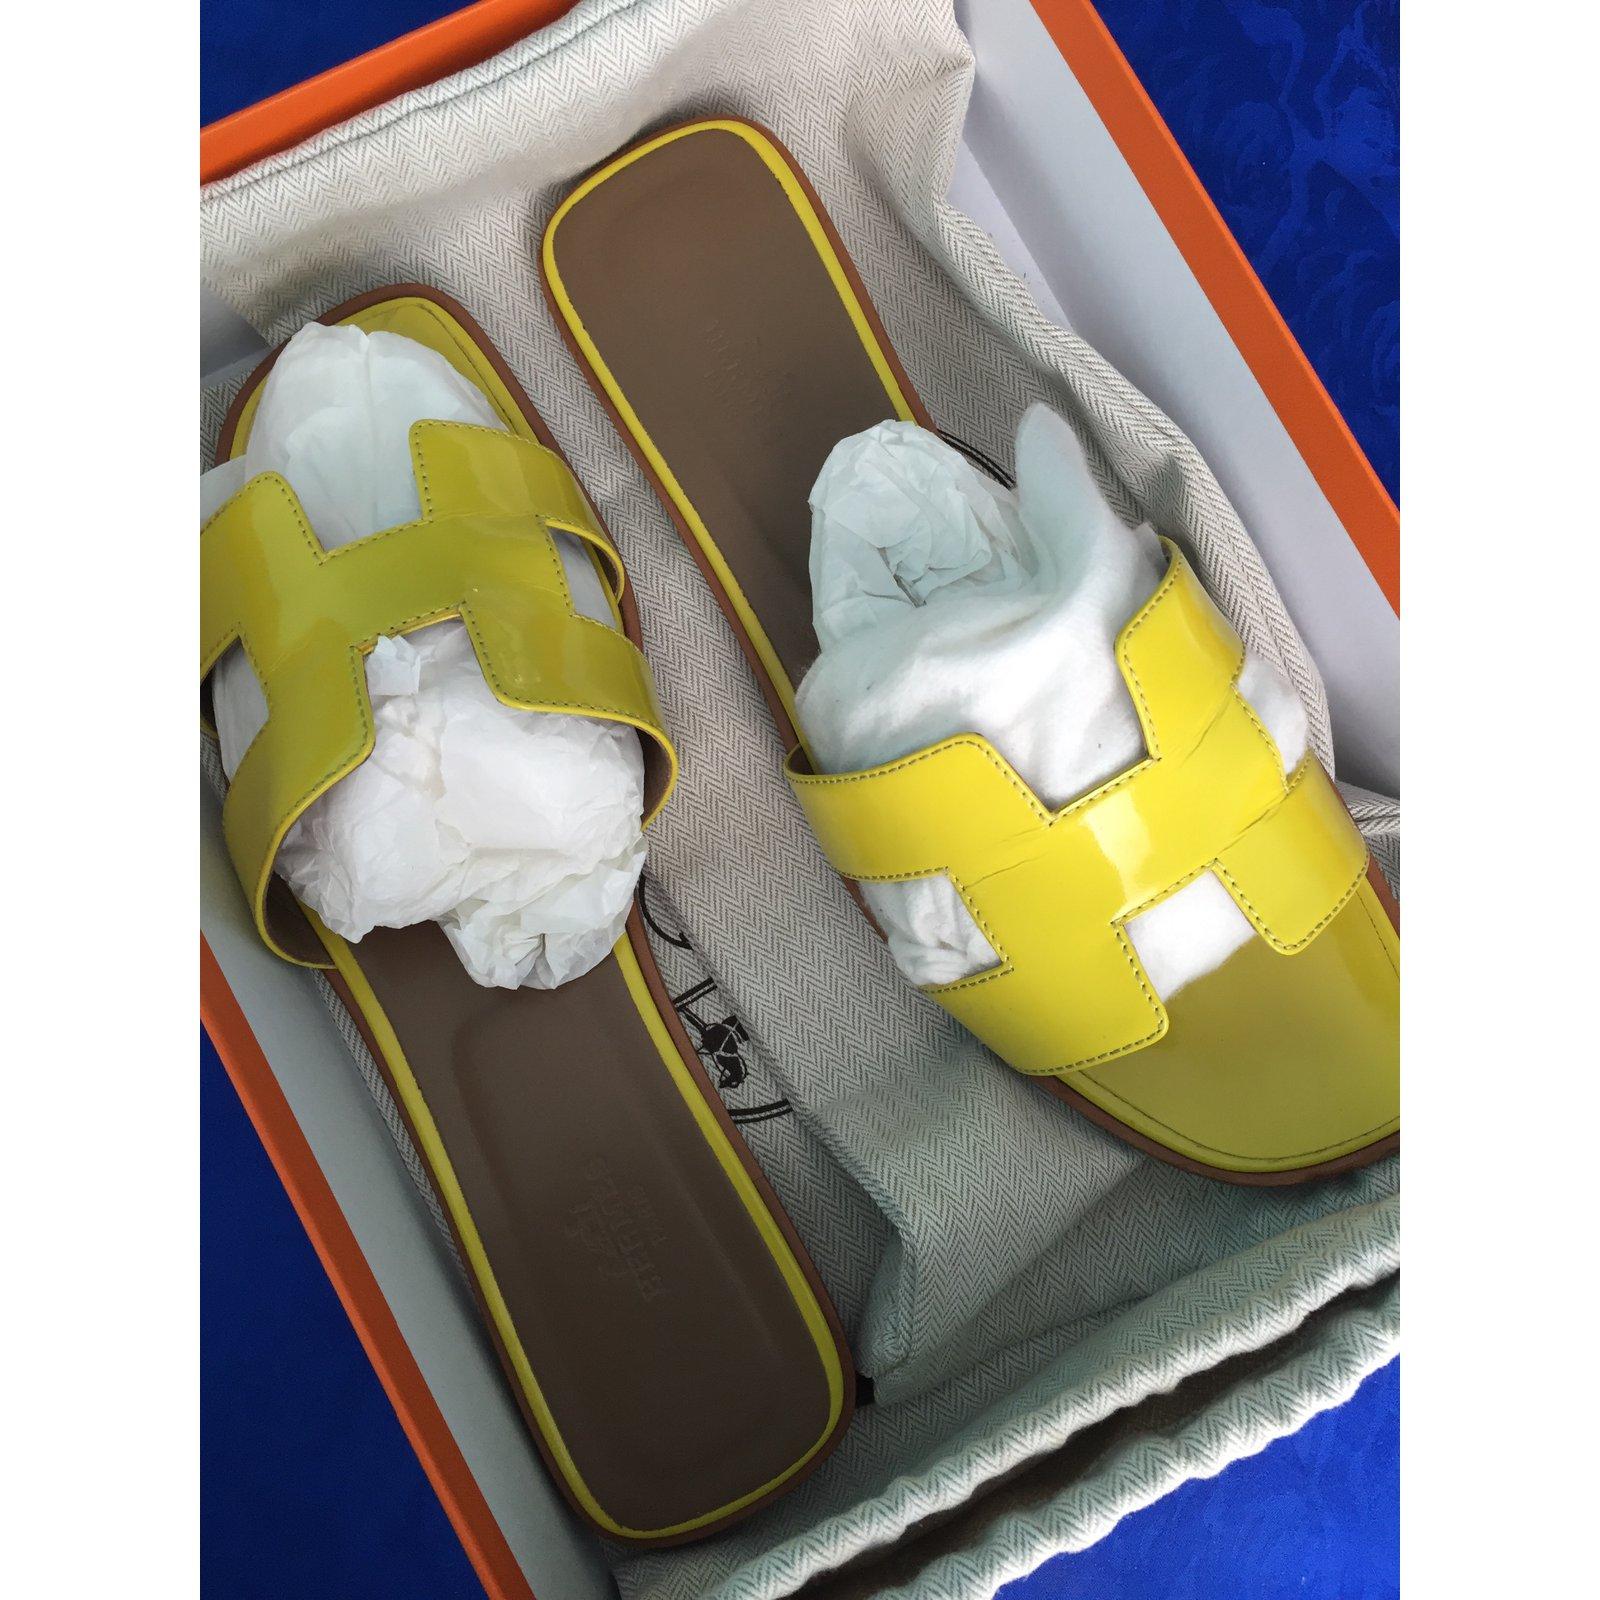 bab176d02178 Hermès Oran Vernis fluo Sandals Patent leather Yellow ref.16713 - Joli  Closet